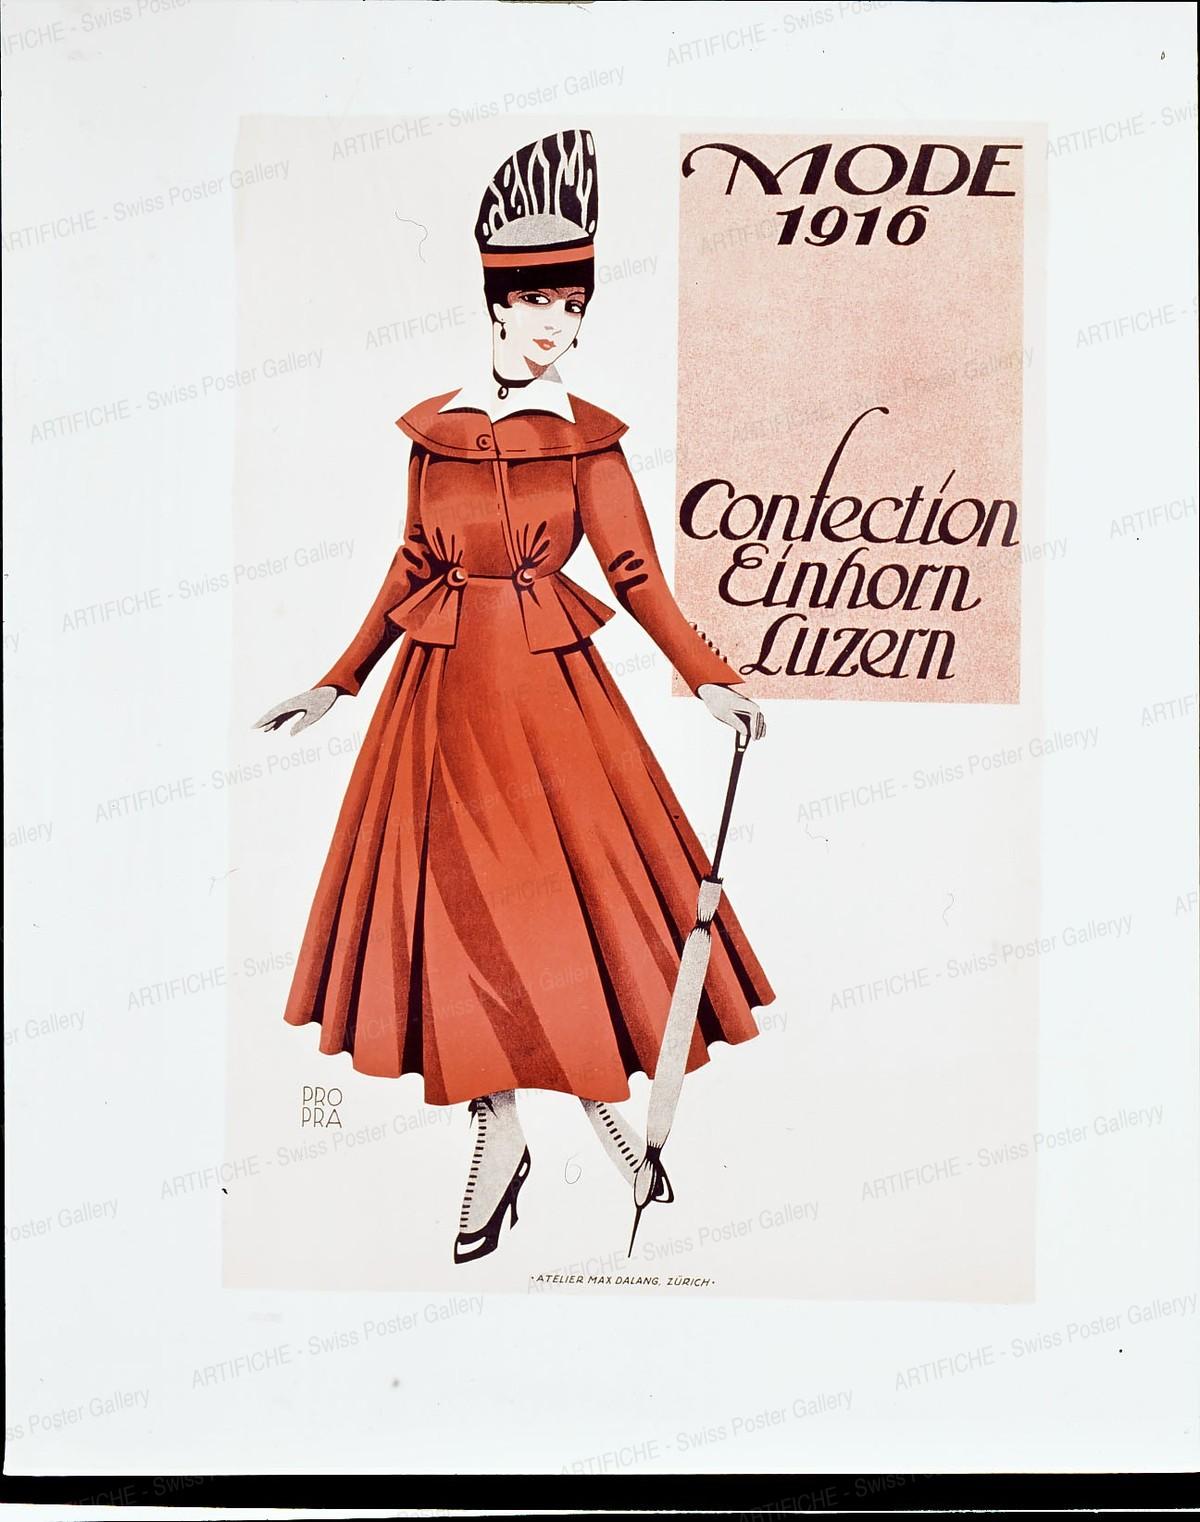 Mode 1916 – Confection Einhorn Luzern, Max Dalang